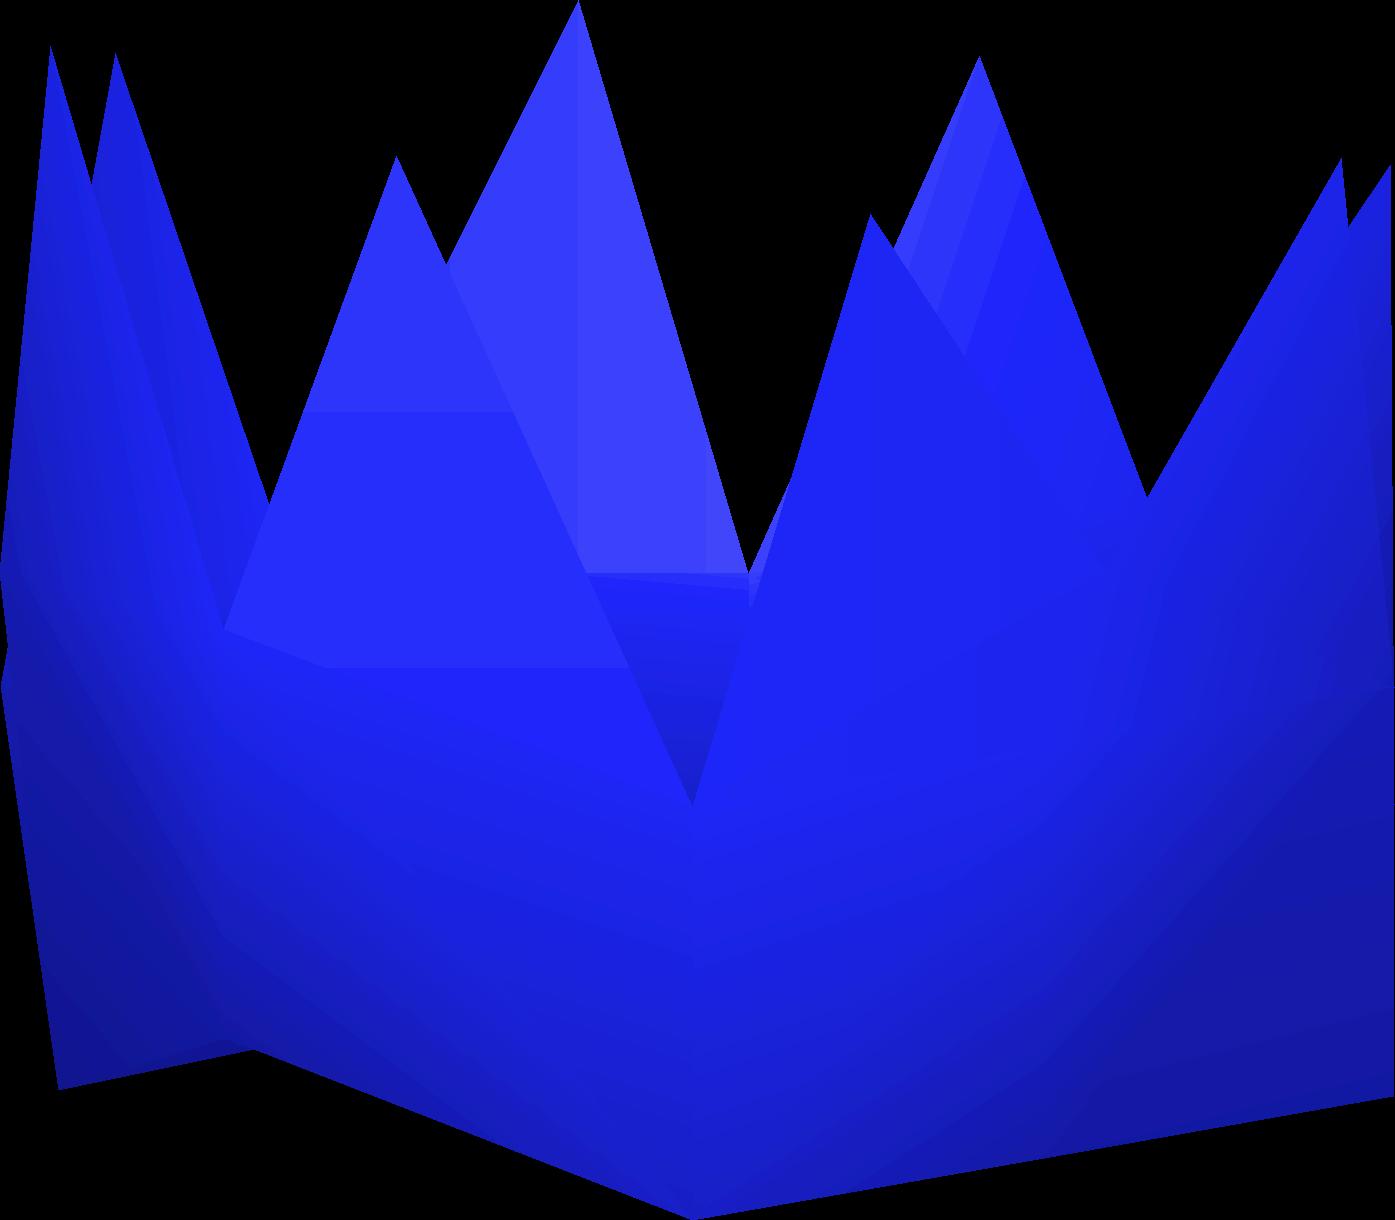 Blue Partyhat Osrs Wiki